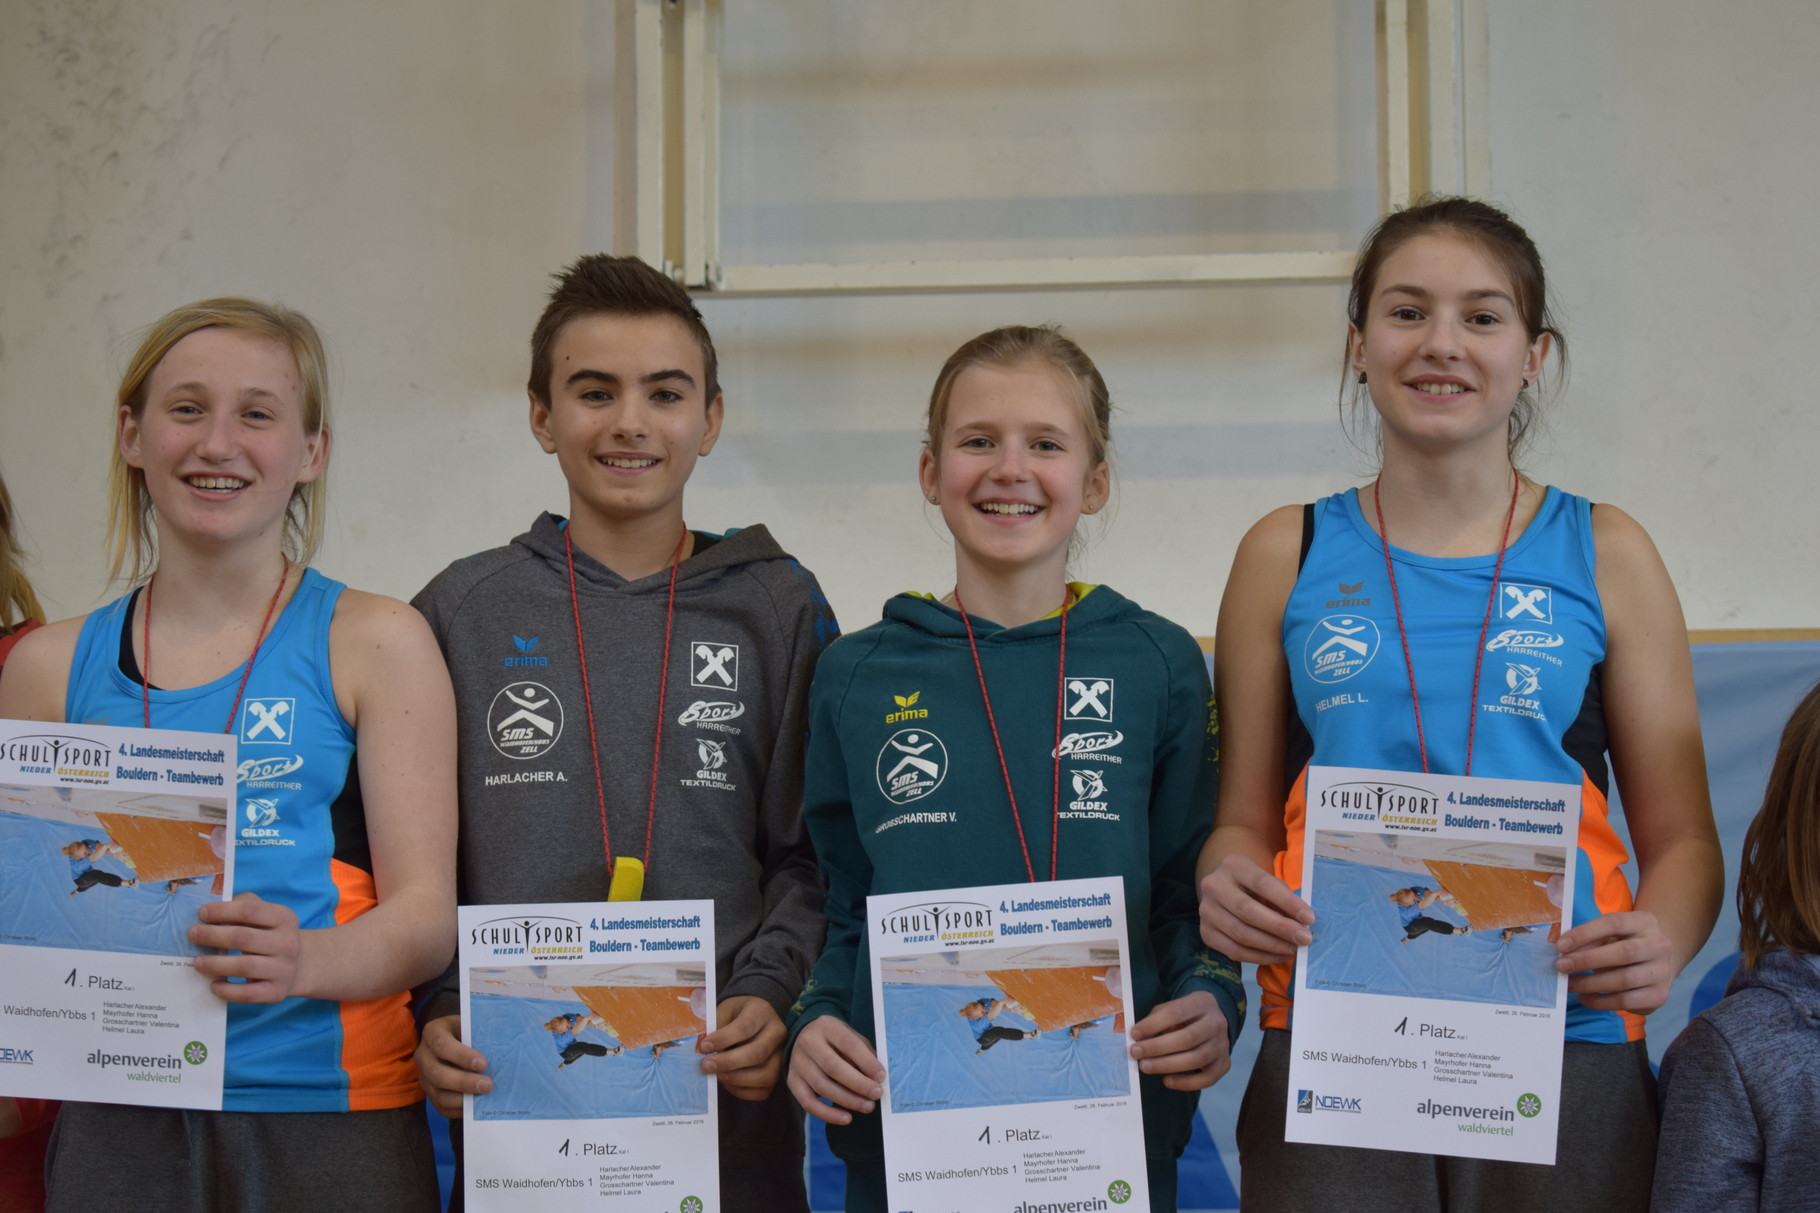 NÖ-Landesmeister im Bouldern 2016 (Teambewerb) Hanna Mayrhofer – Alexander Harlacher – Valentina Großschartner – Laura Helmel